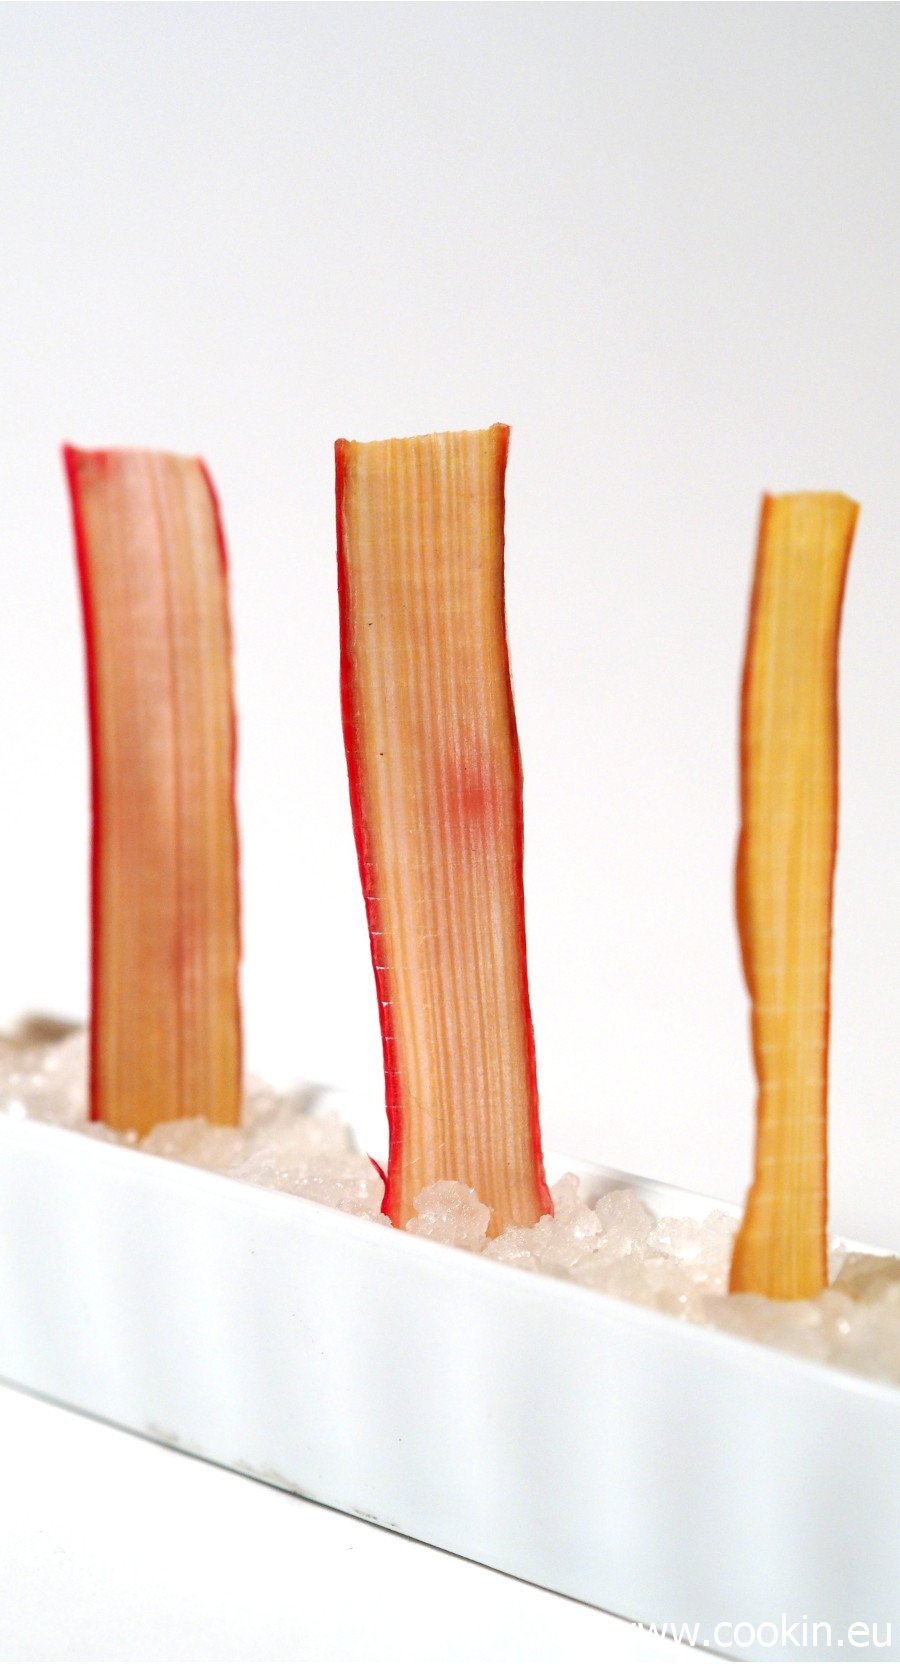 rhabarber-chips-5-900-hk